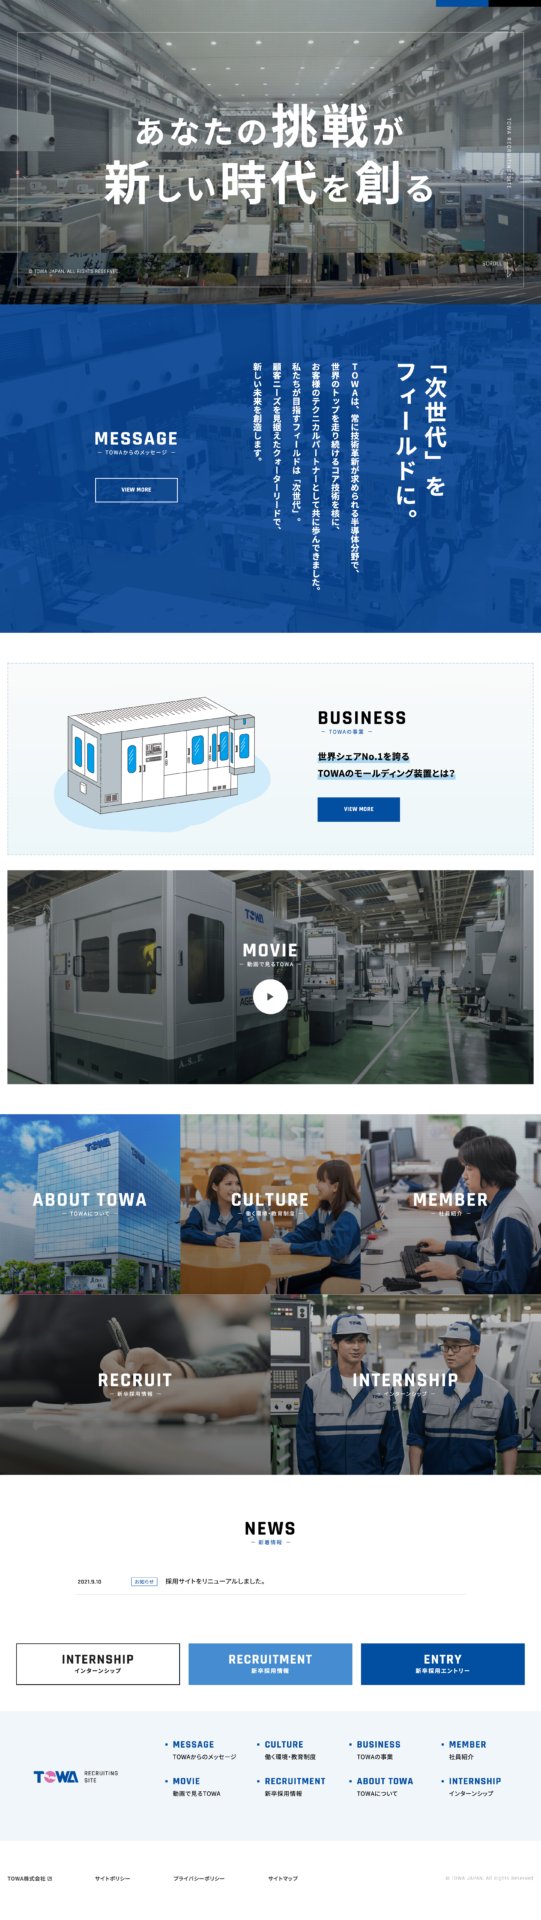 TOWA様 リクルートサイト